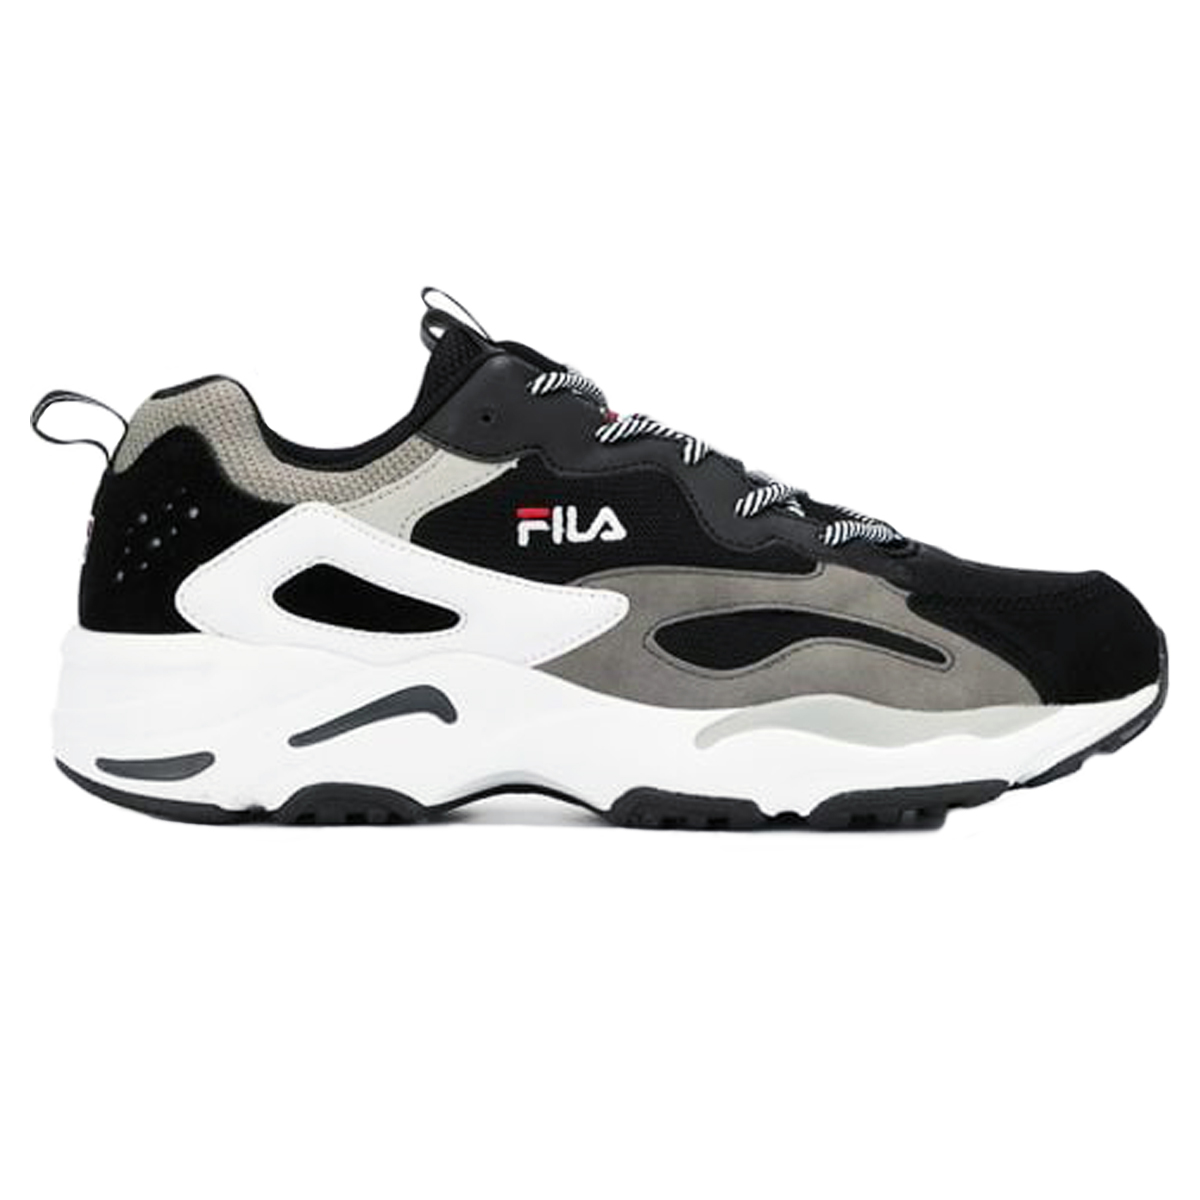 Sneakers Uomo Fila Ray Tracer 1010685 I Nuvolari.biz